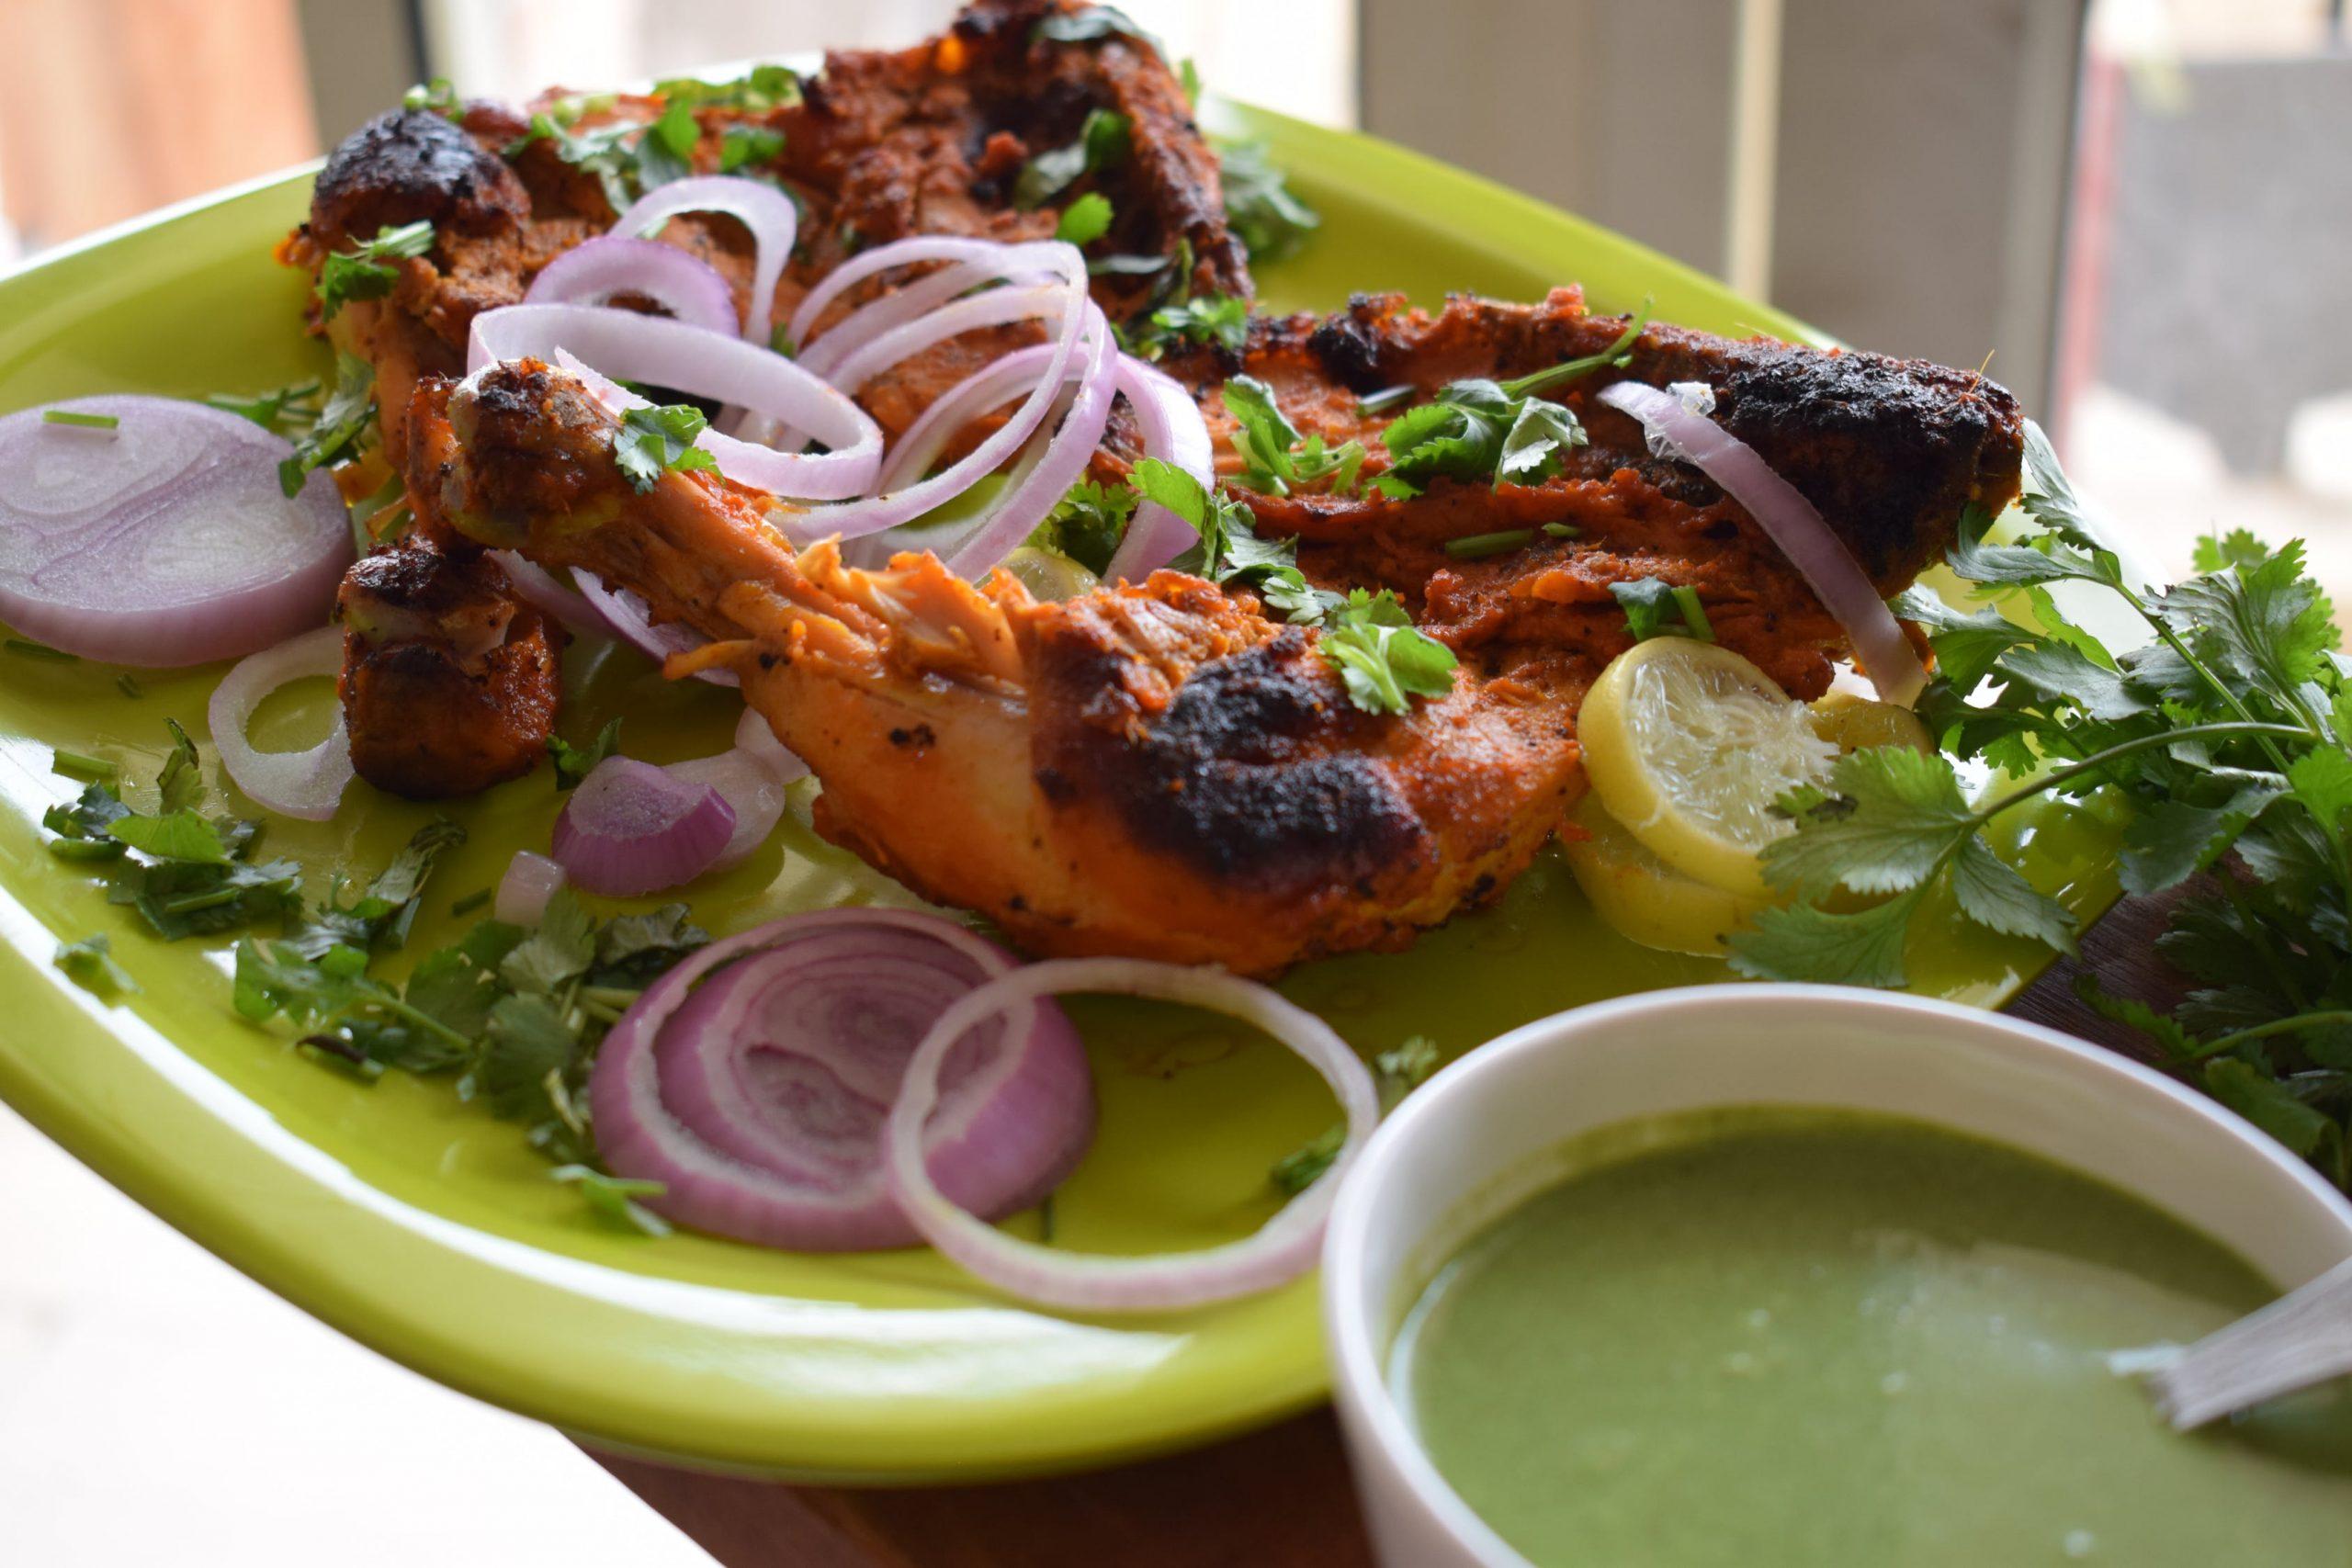 Maharaja Restaurant - Eat Chicken Tandoori in Chikmagalur